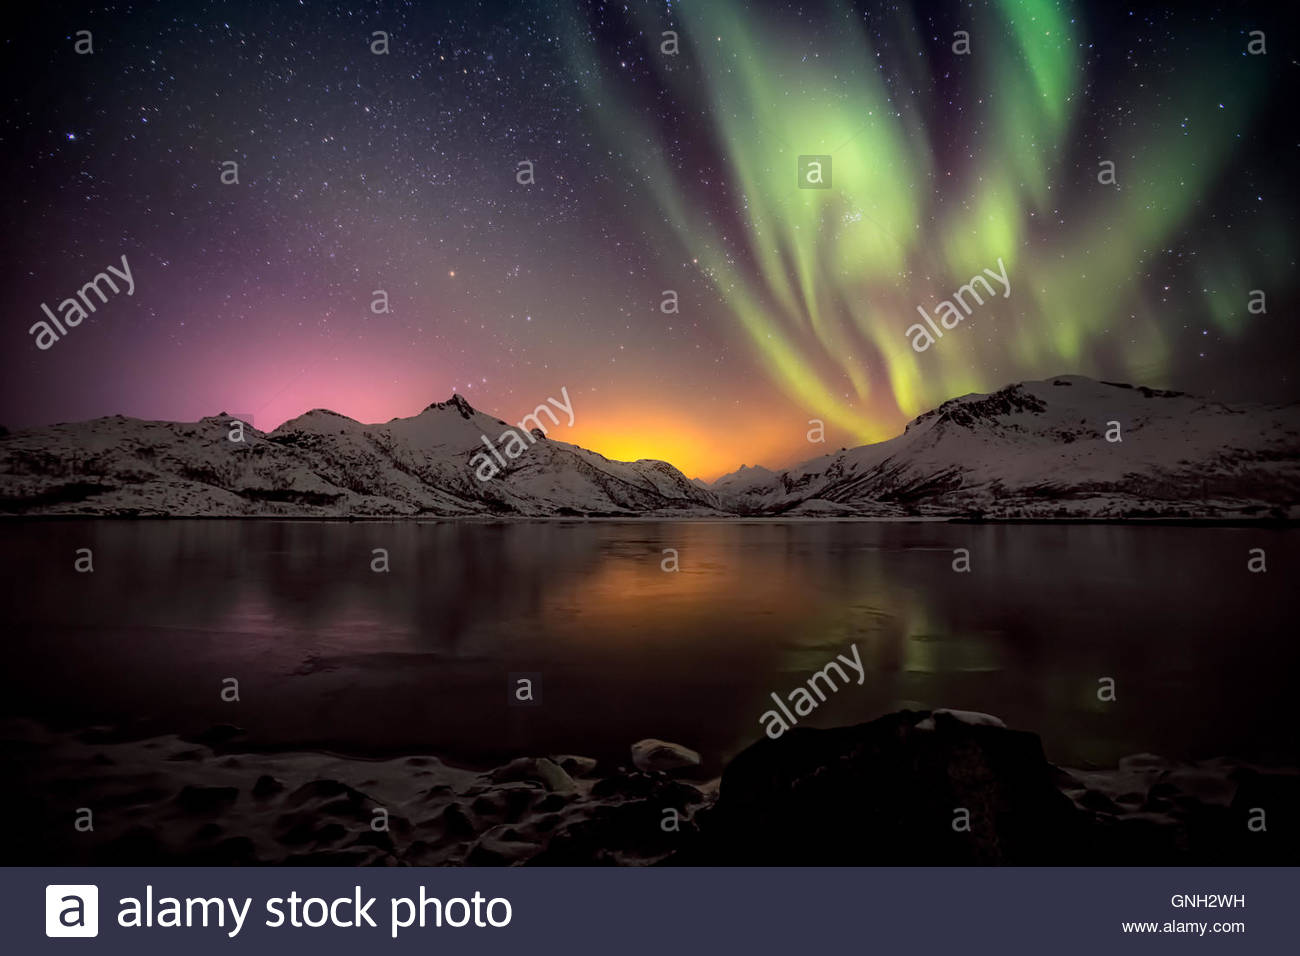 Aurora borealis, Lofoten archipelago, Nordland, Norway - Stock Image